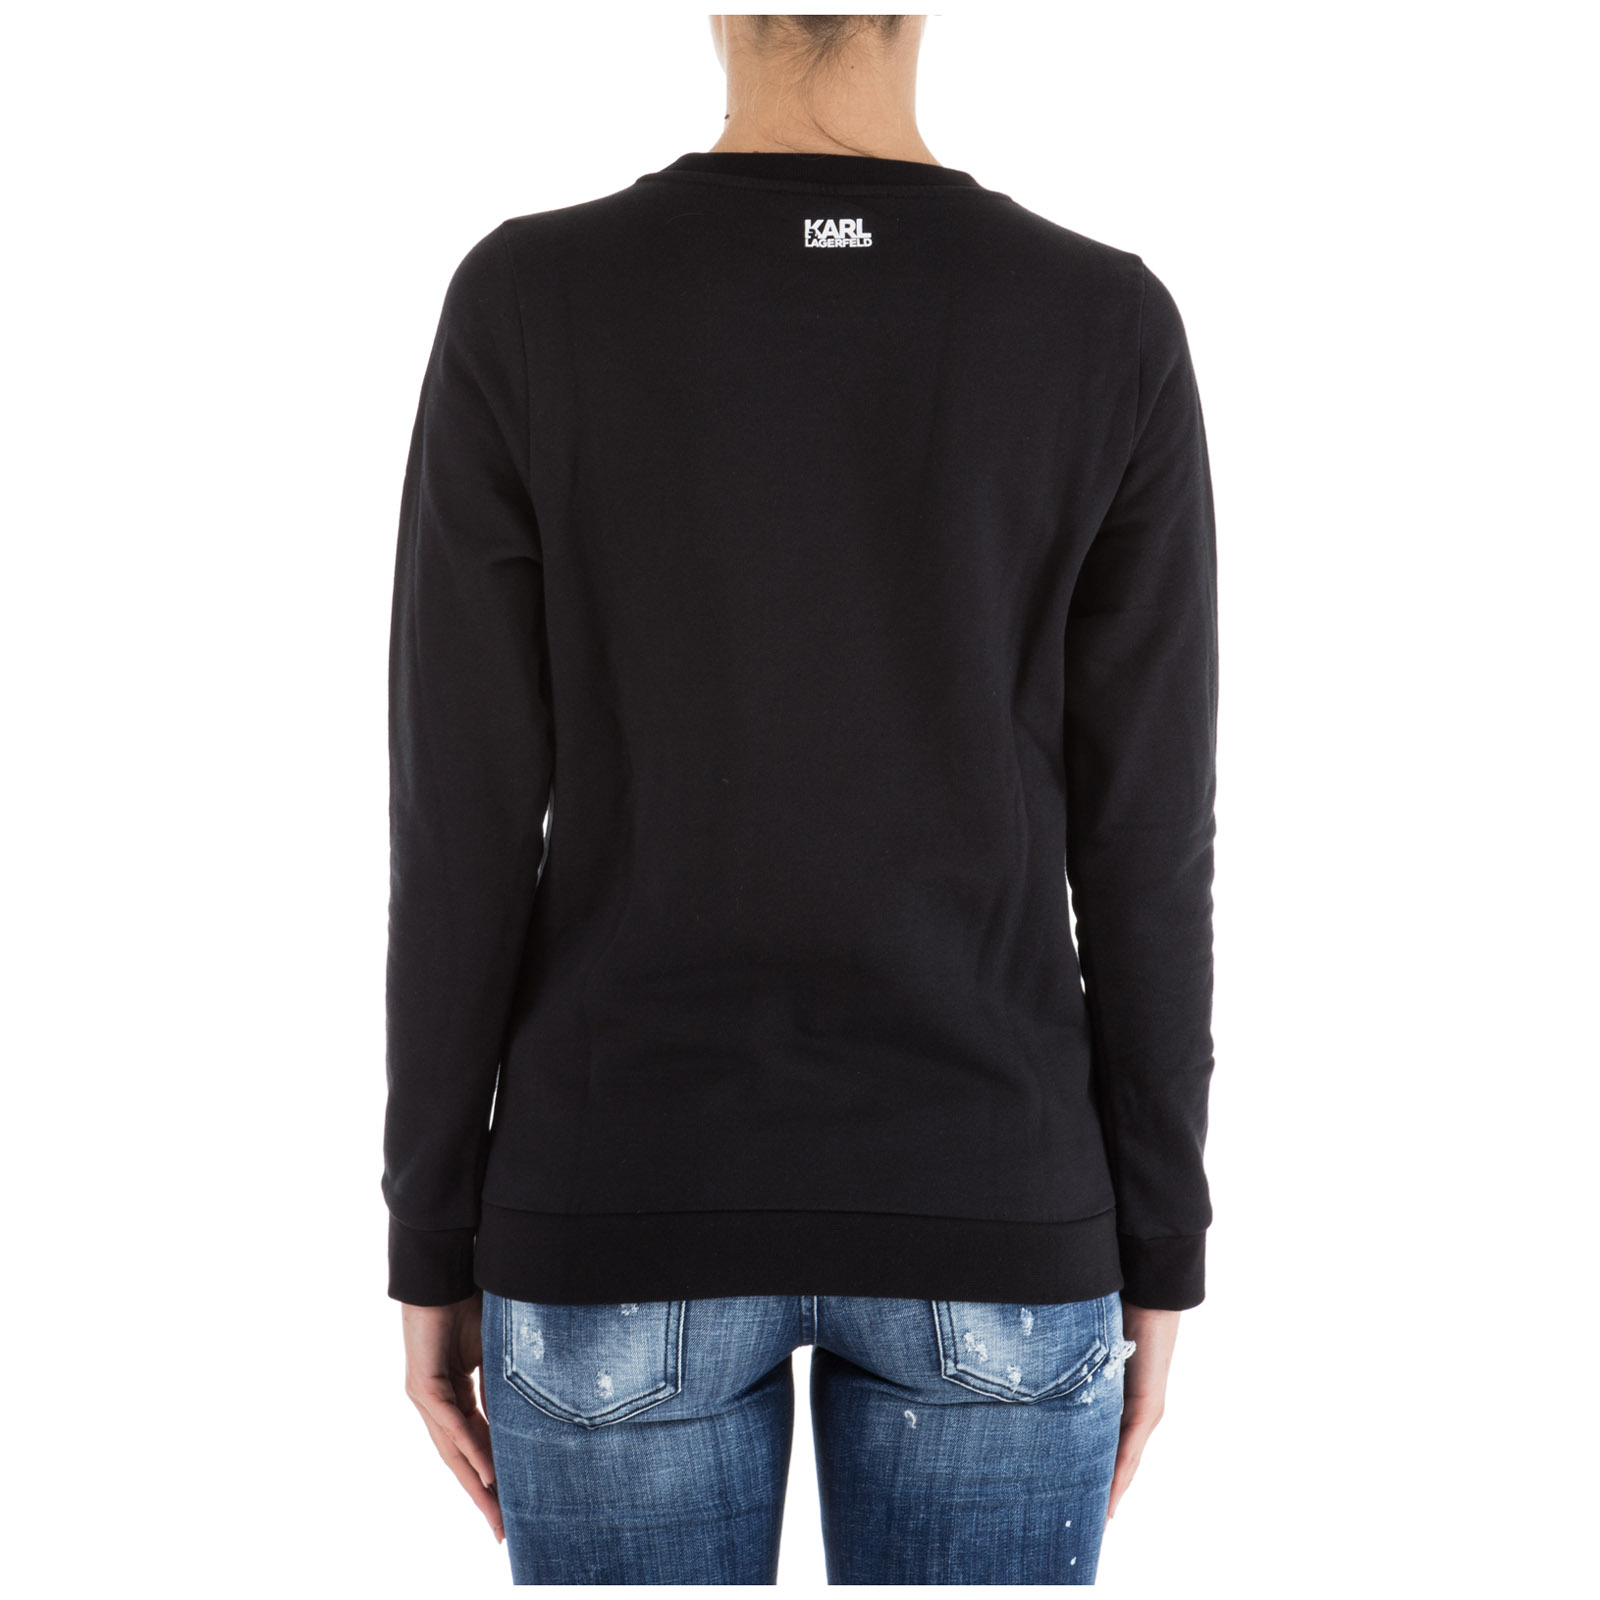 Women's sweatshirt ikonik